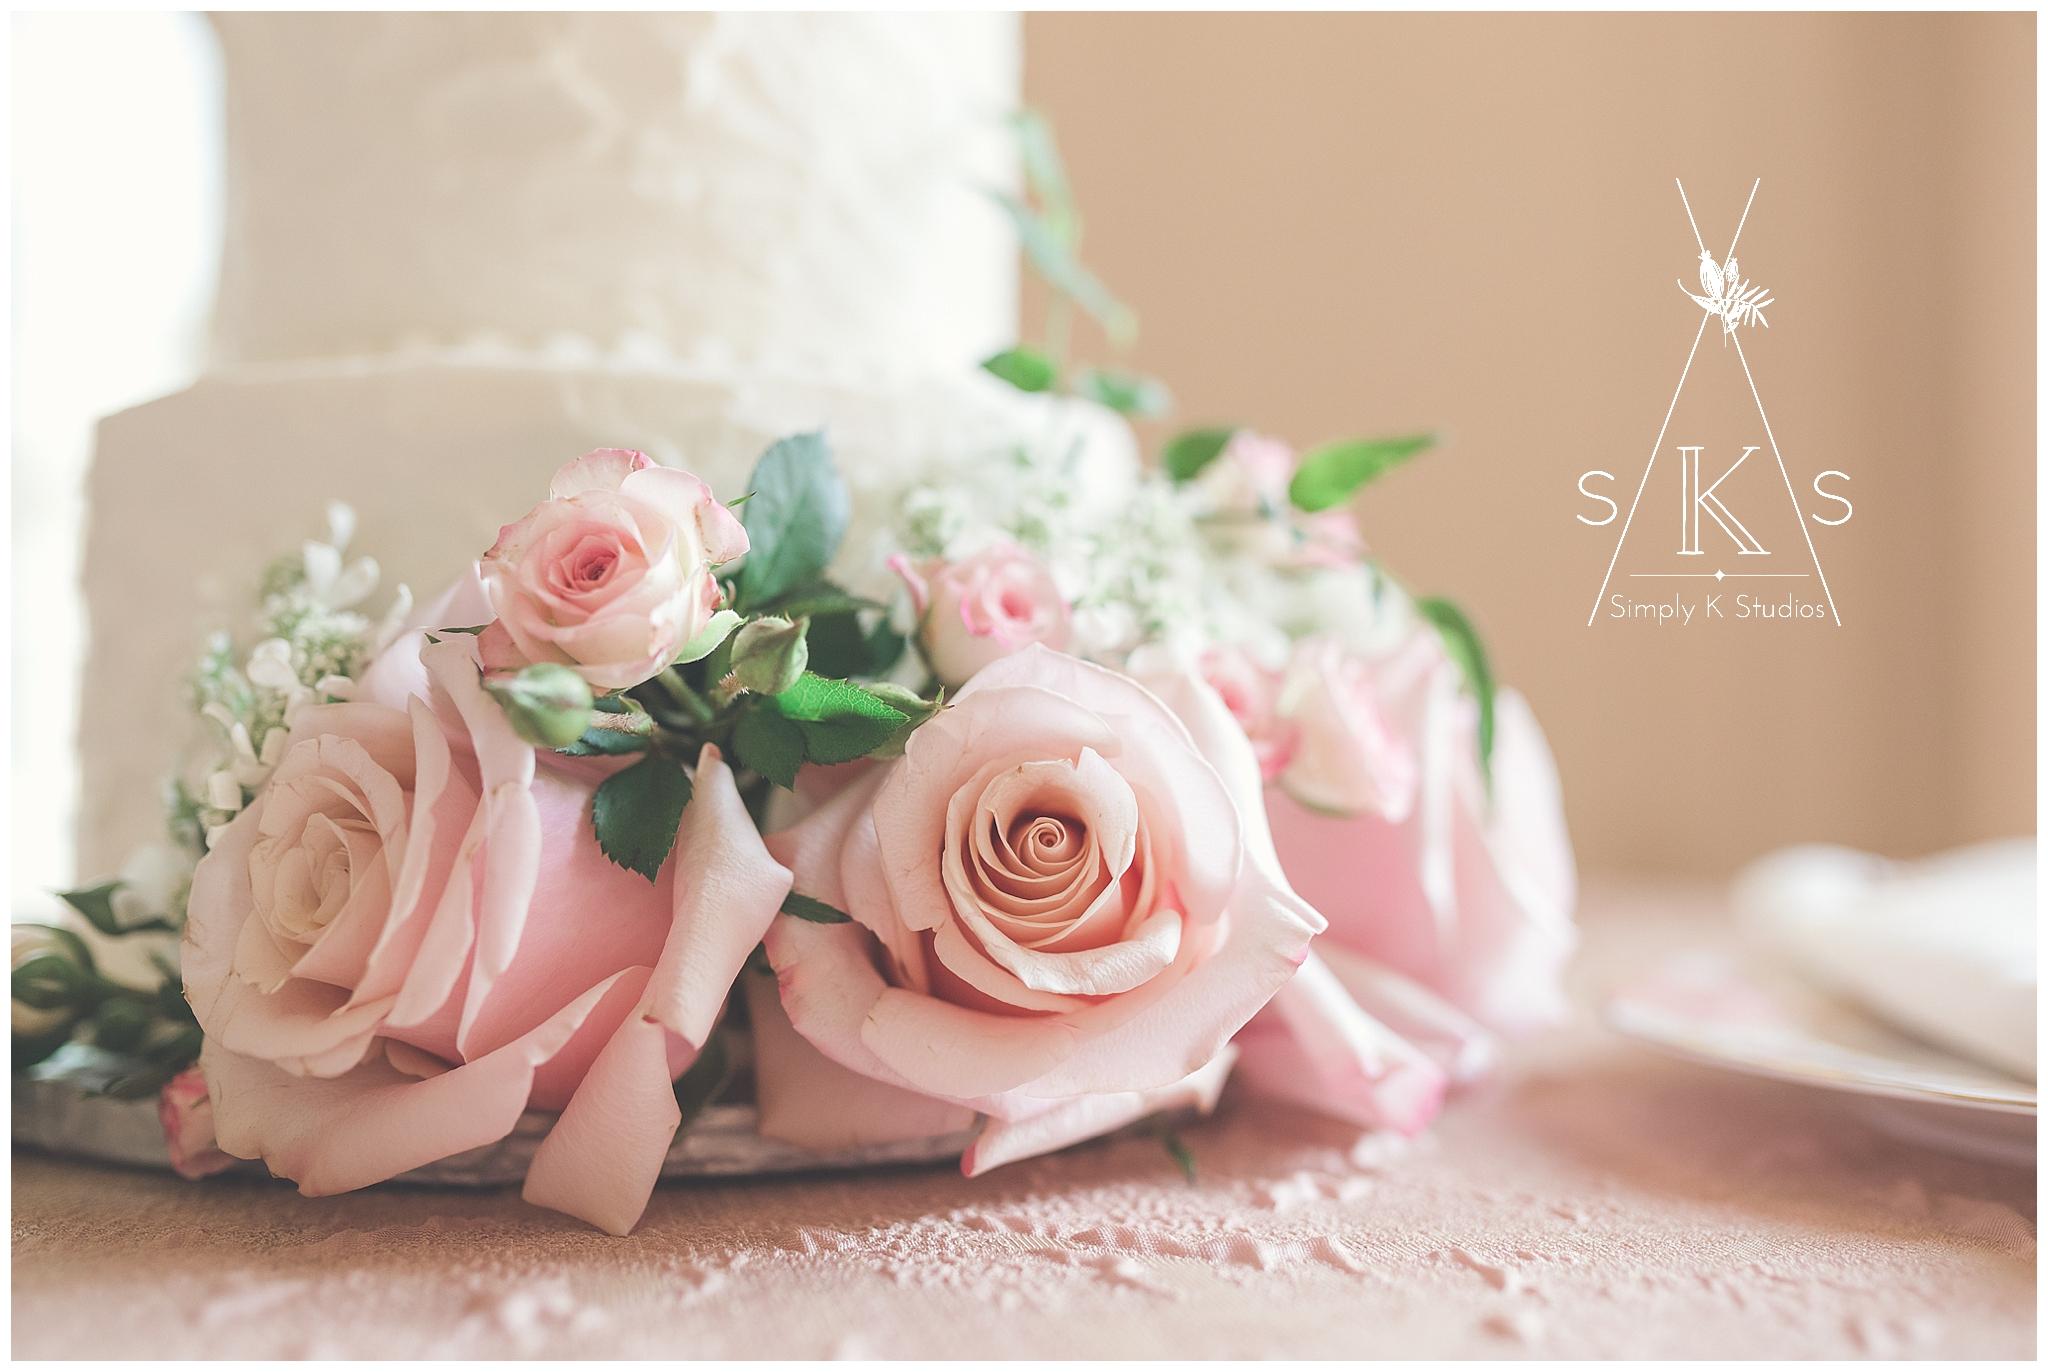 Elegant Wedding Cake ideas